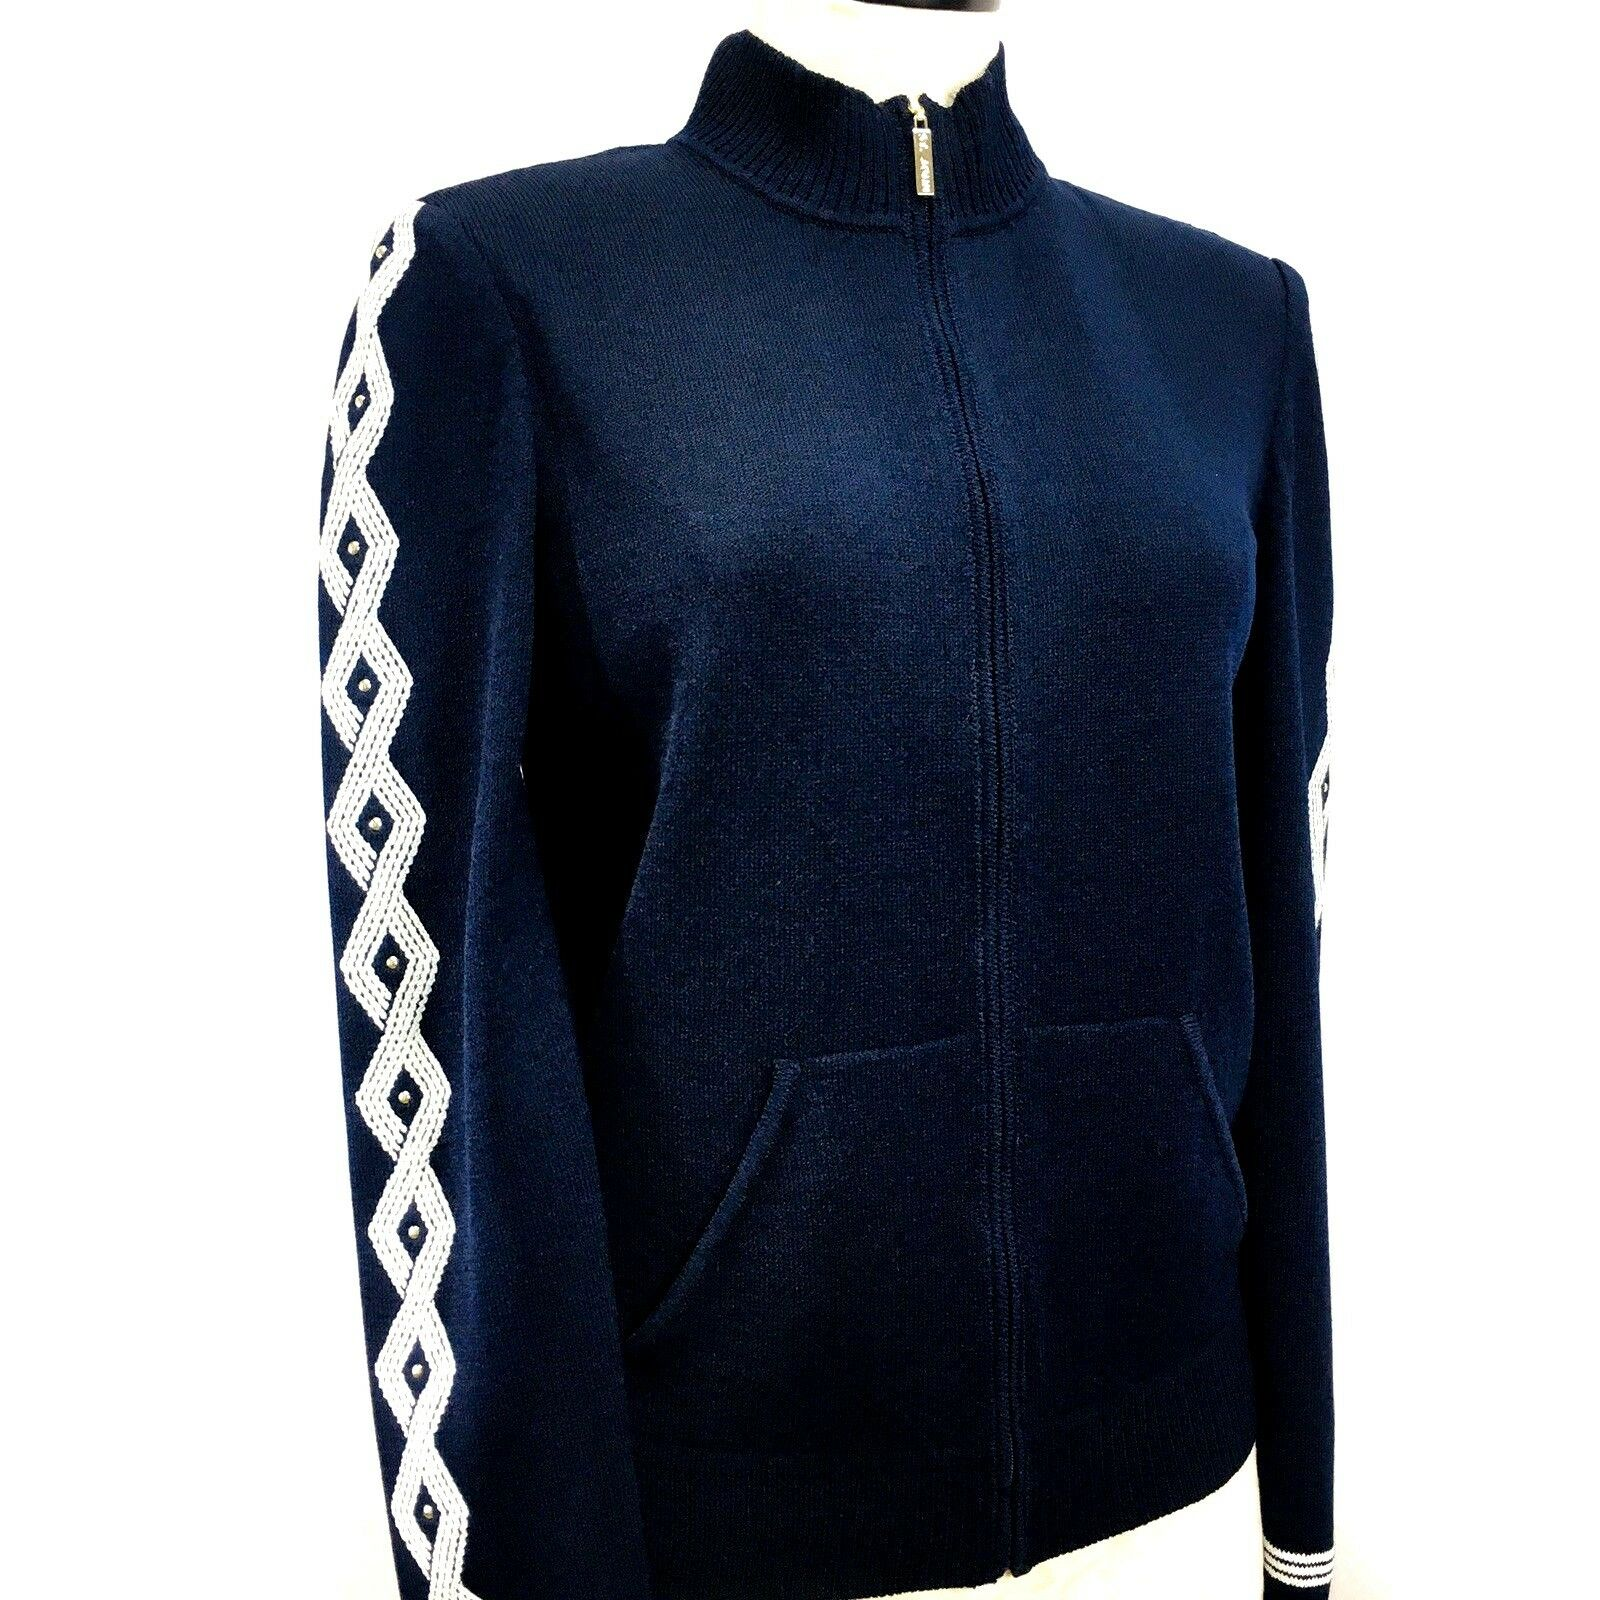 NEW St John Zippered Knit Sweater Navy White Embellished Sleeves Size 12 K60QQ52